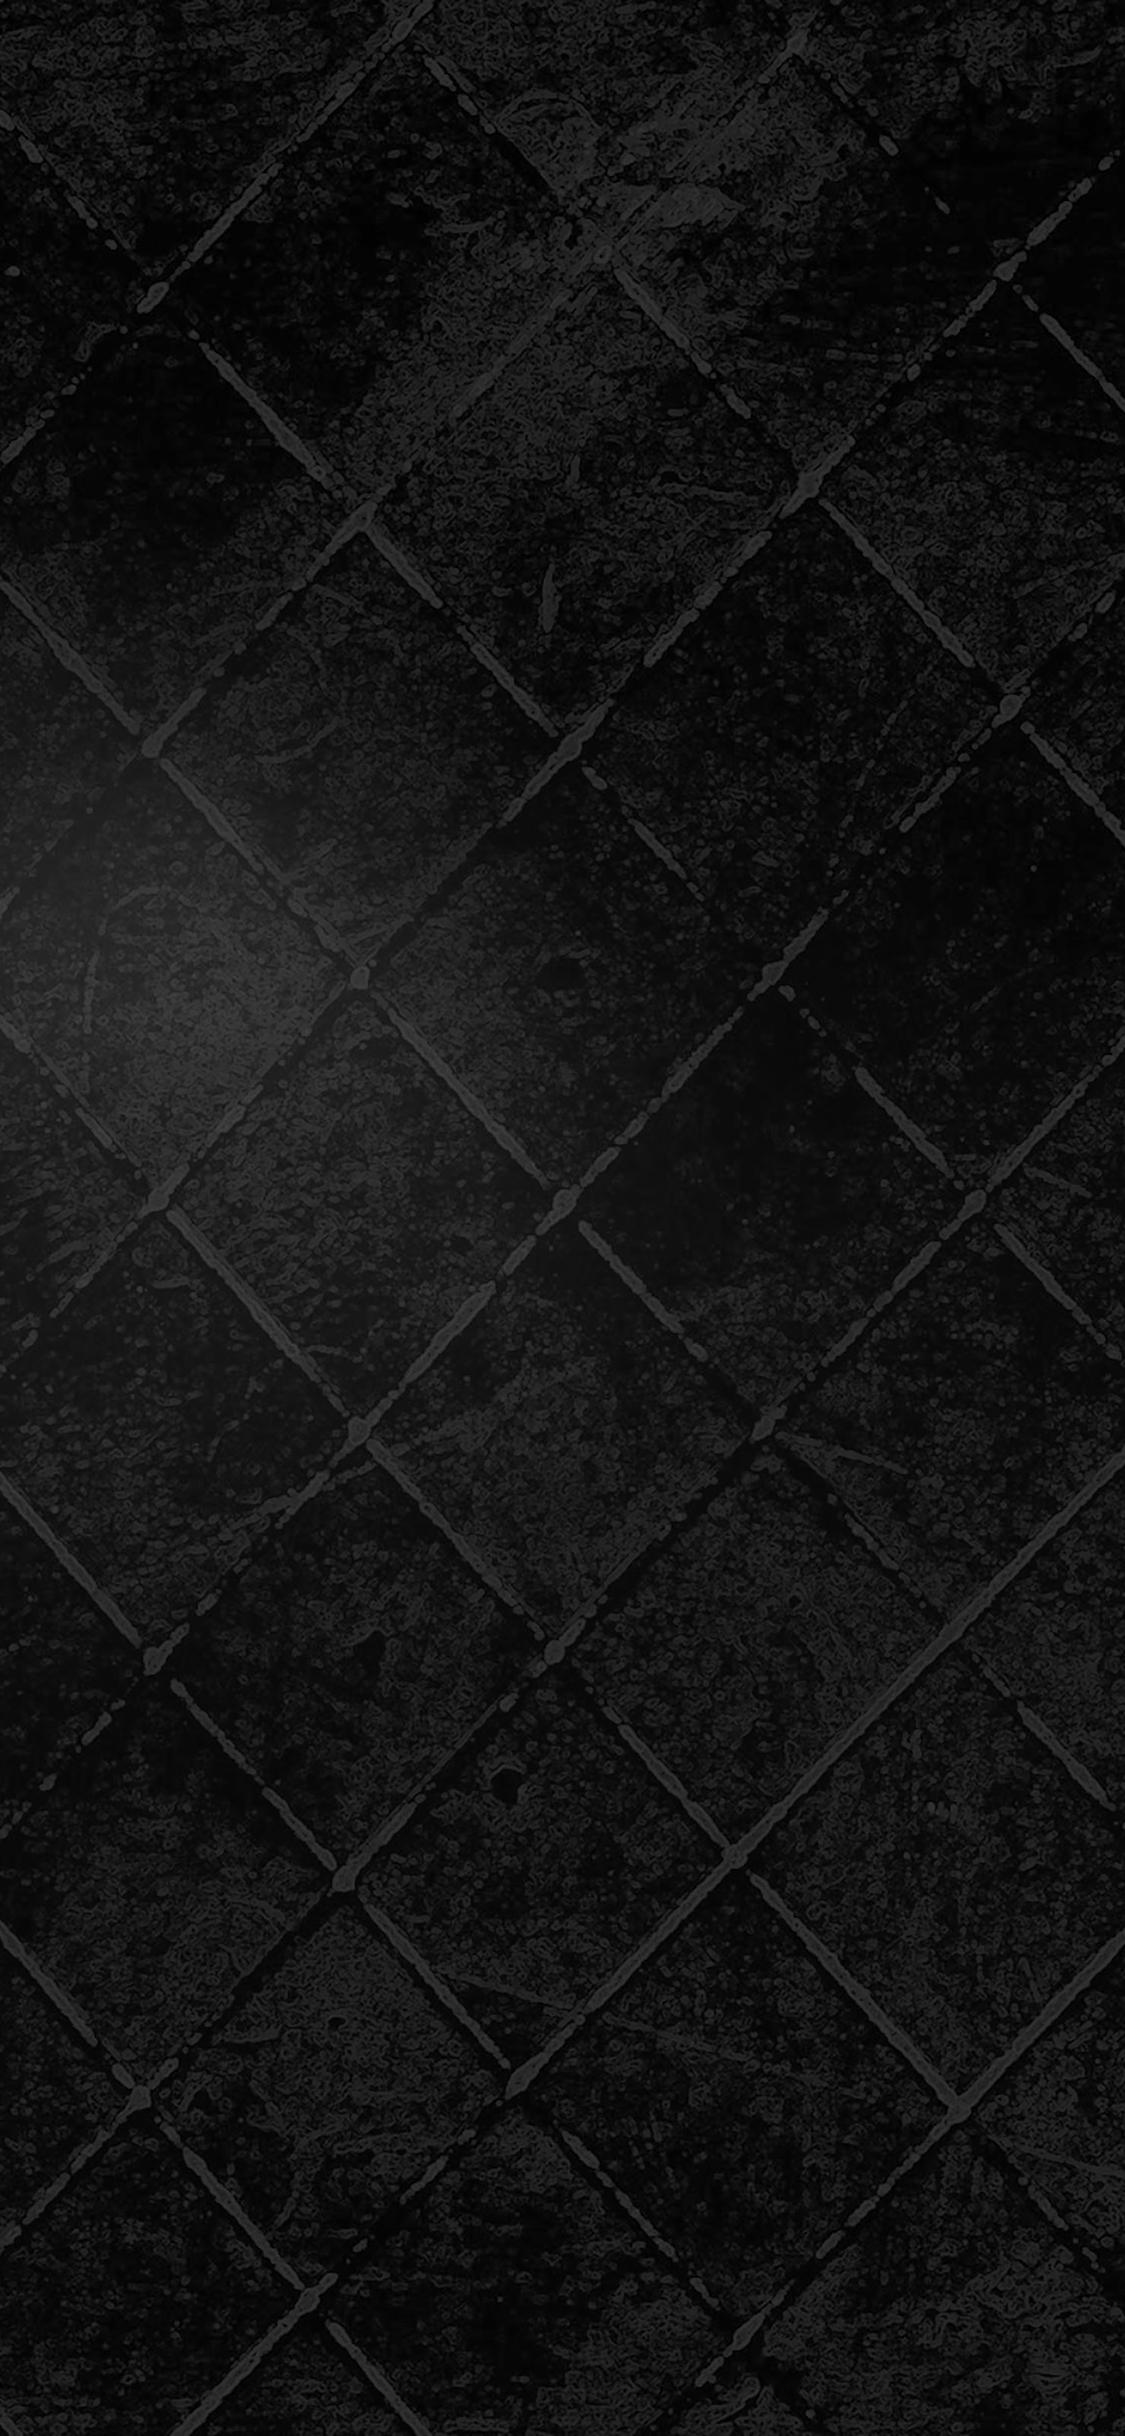 Hd Wallpapers Imac 27 Vb79 Wallpaper Dark Black Grunge Pattern Papers Co